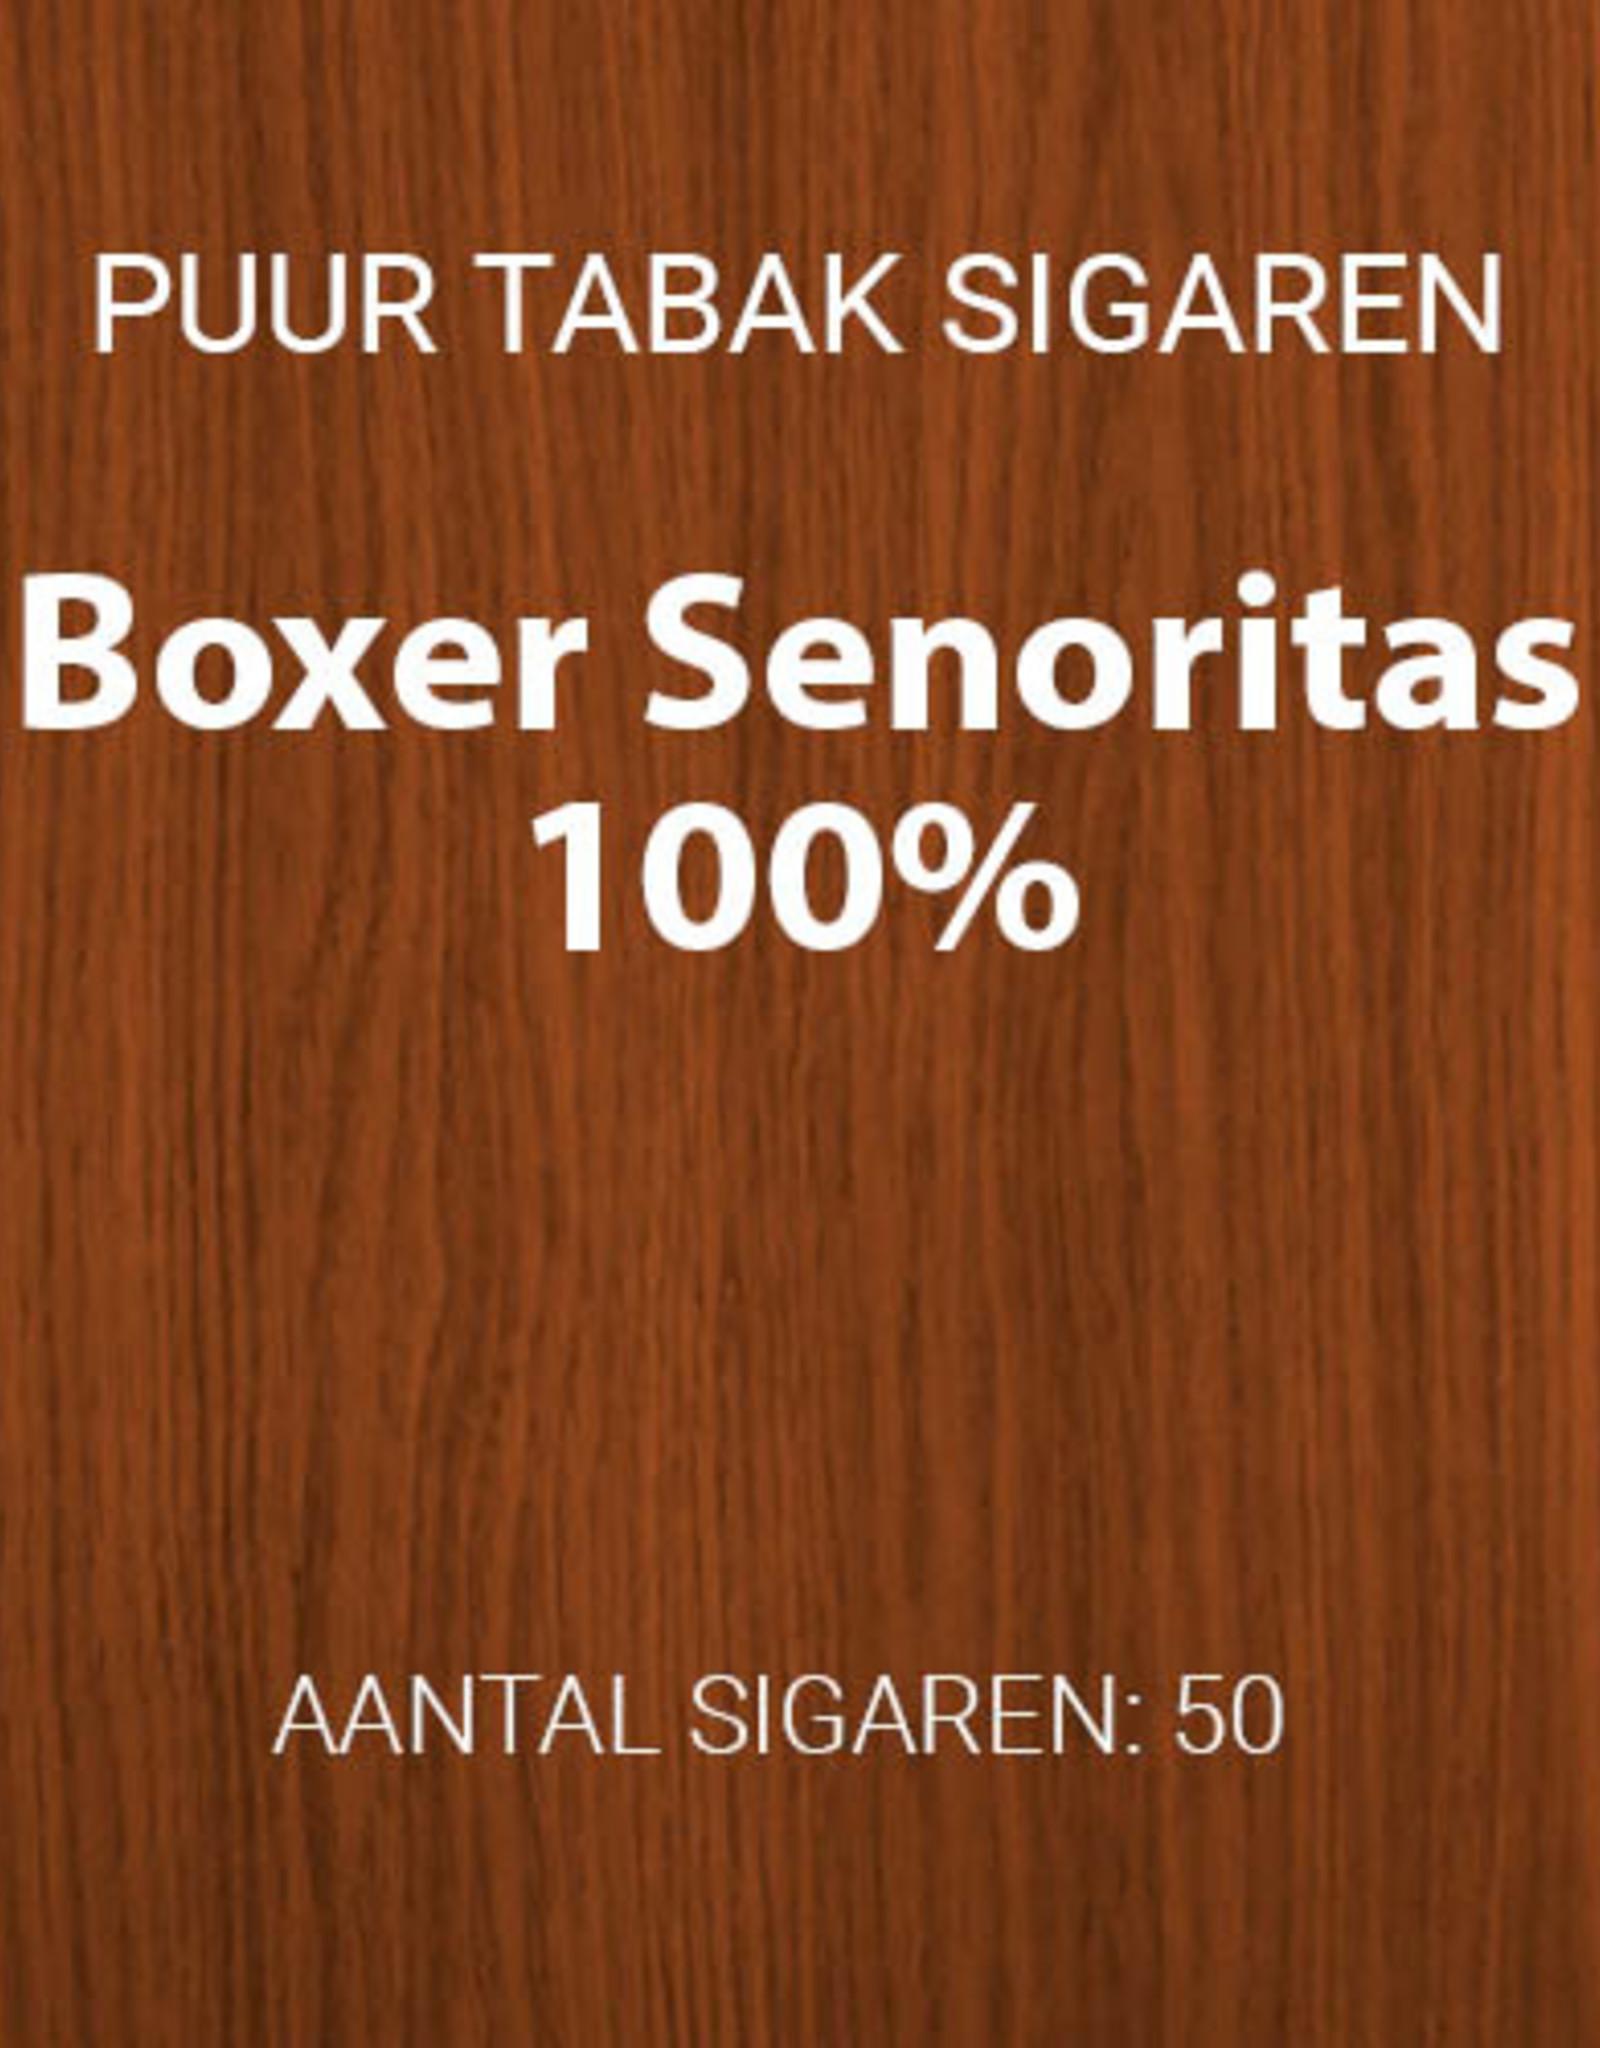 Boxer Serie Senoritas